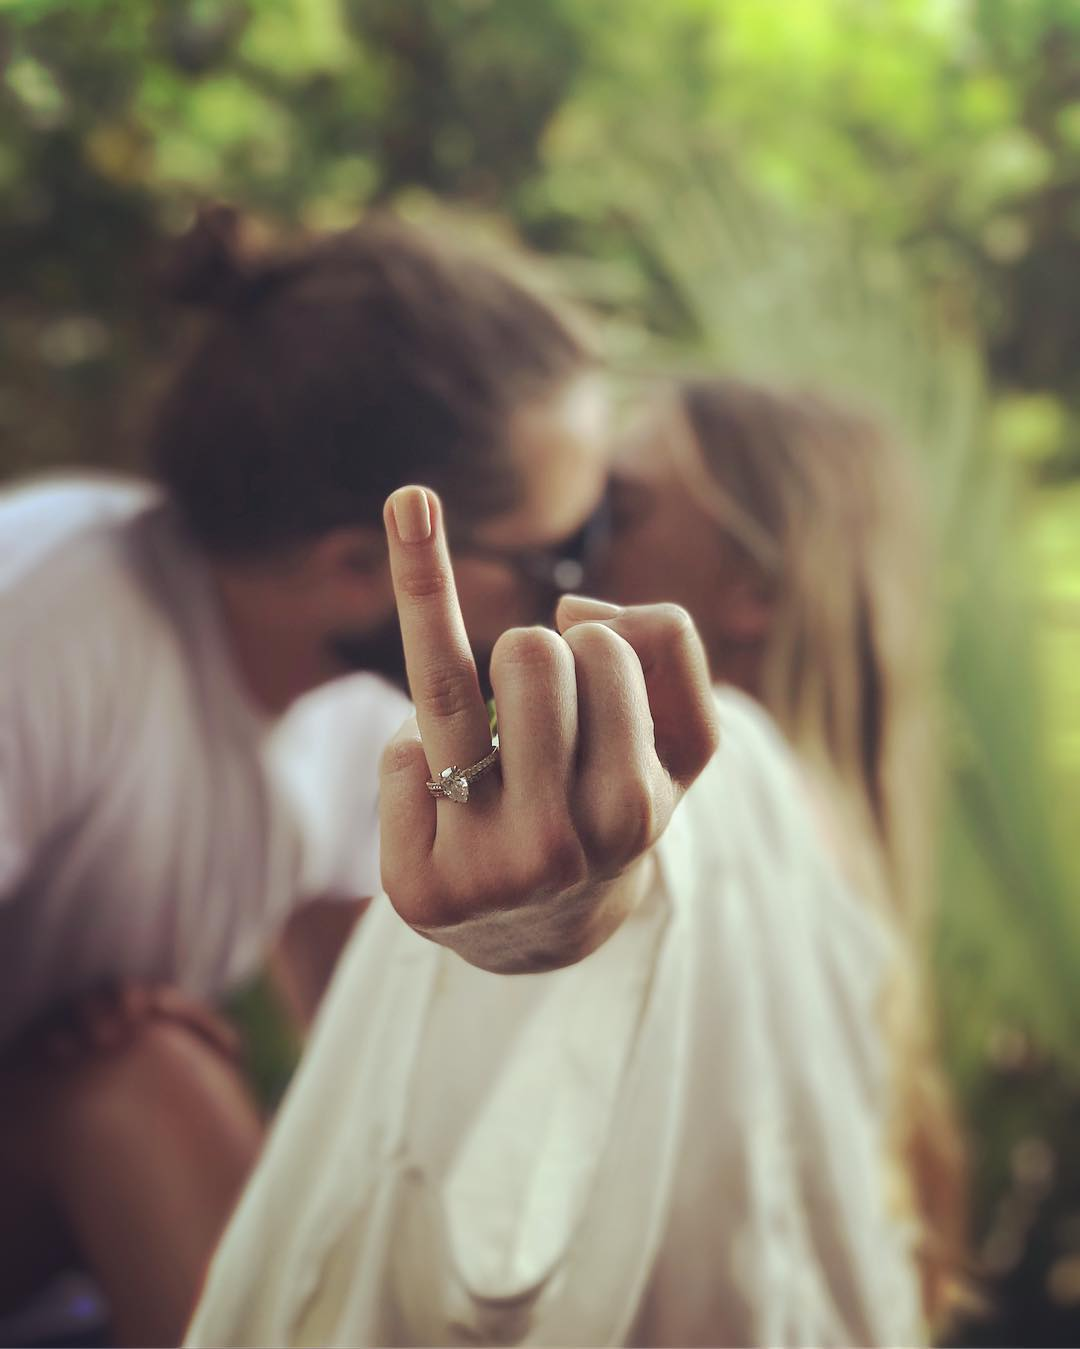 margot-robbie-casamento